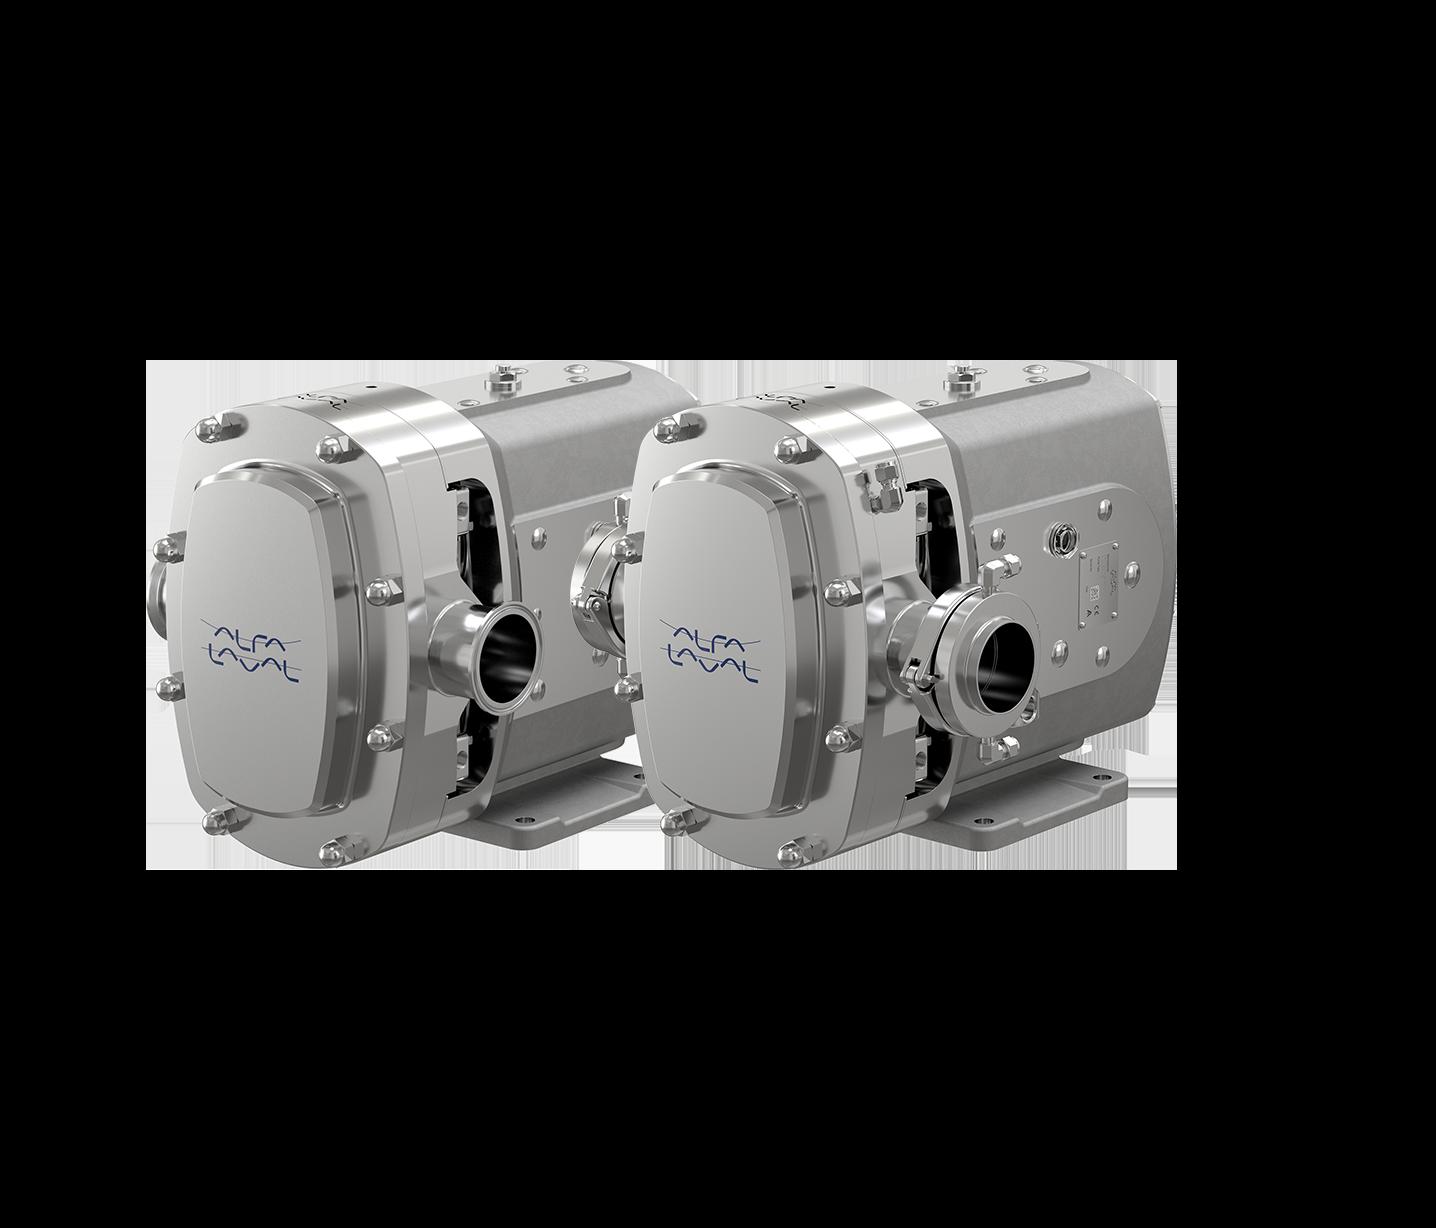 Circumferential piston pump group image Dura Circ Dura Circ Asepticn Pump